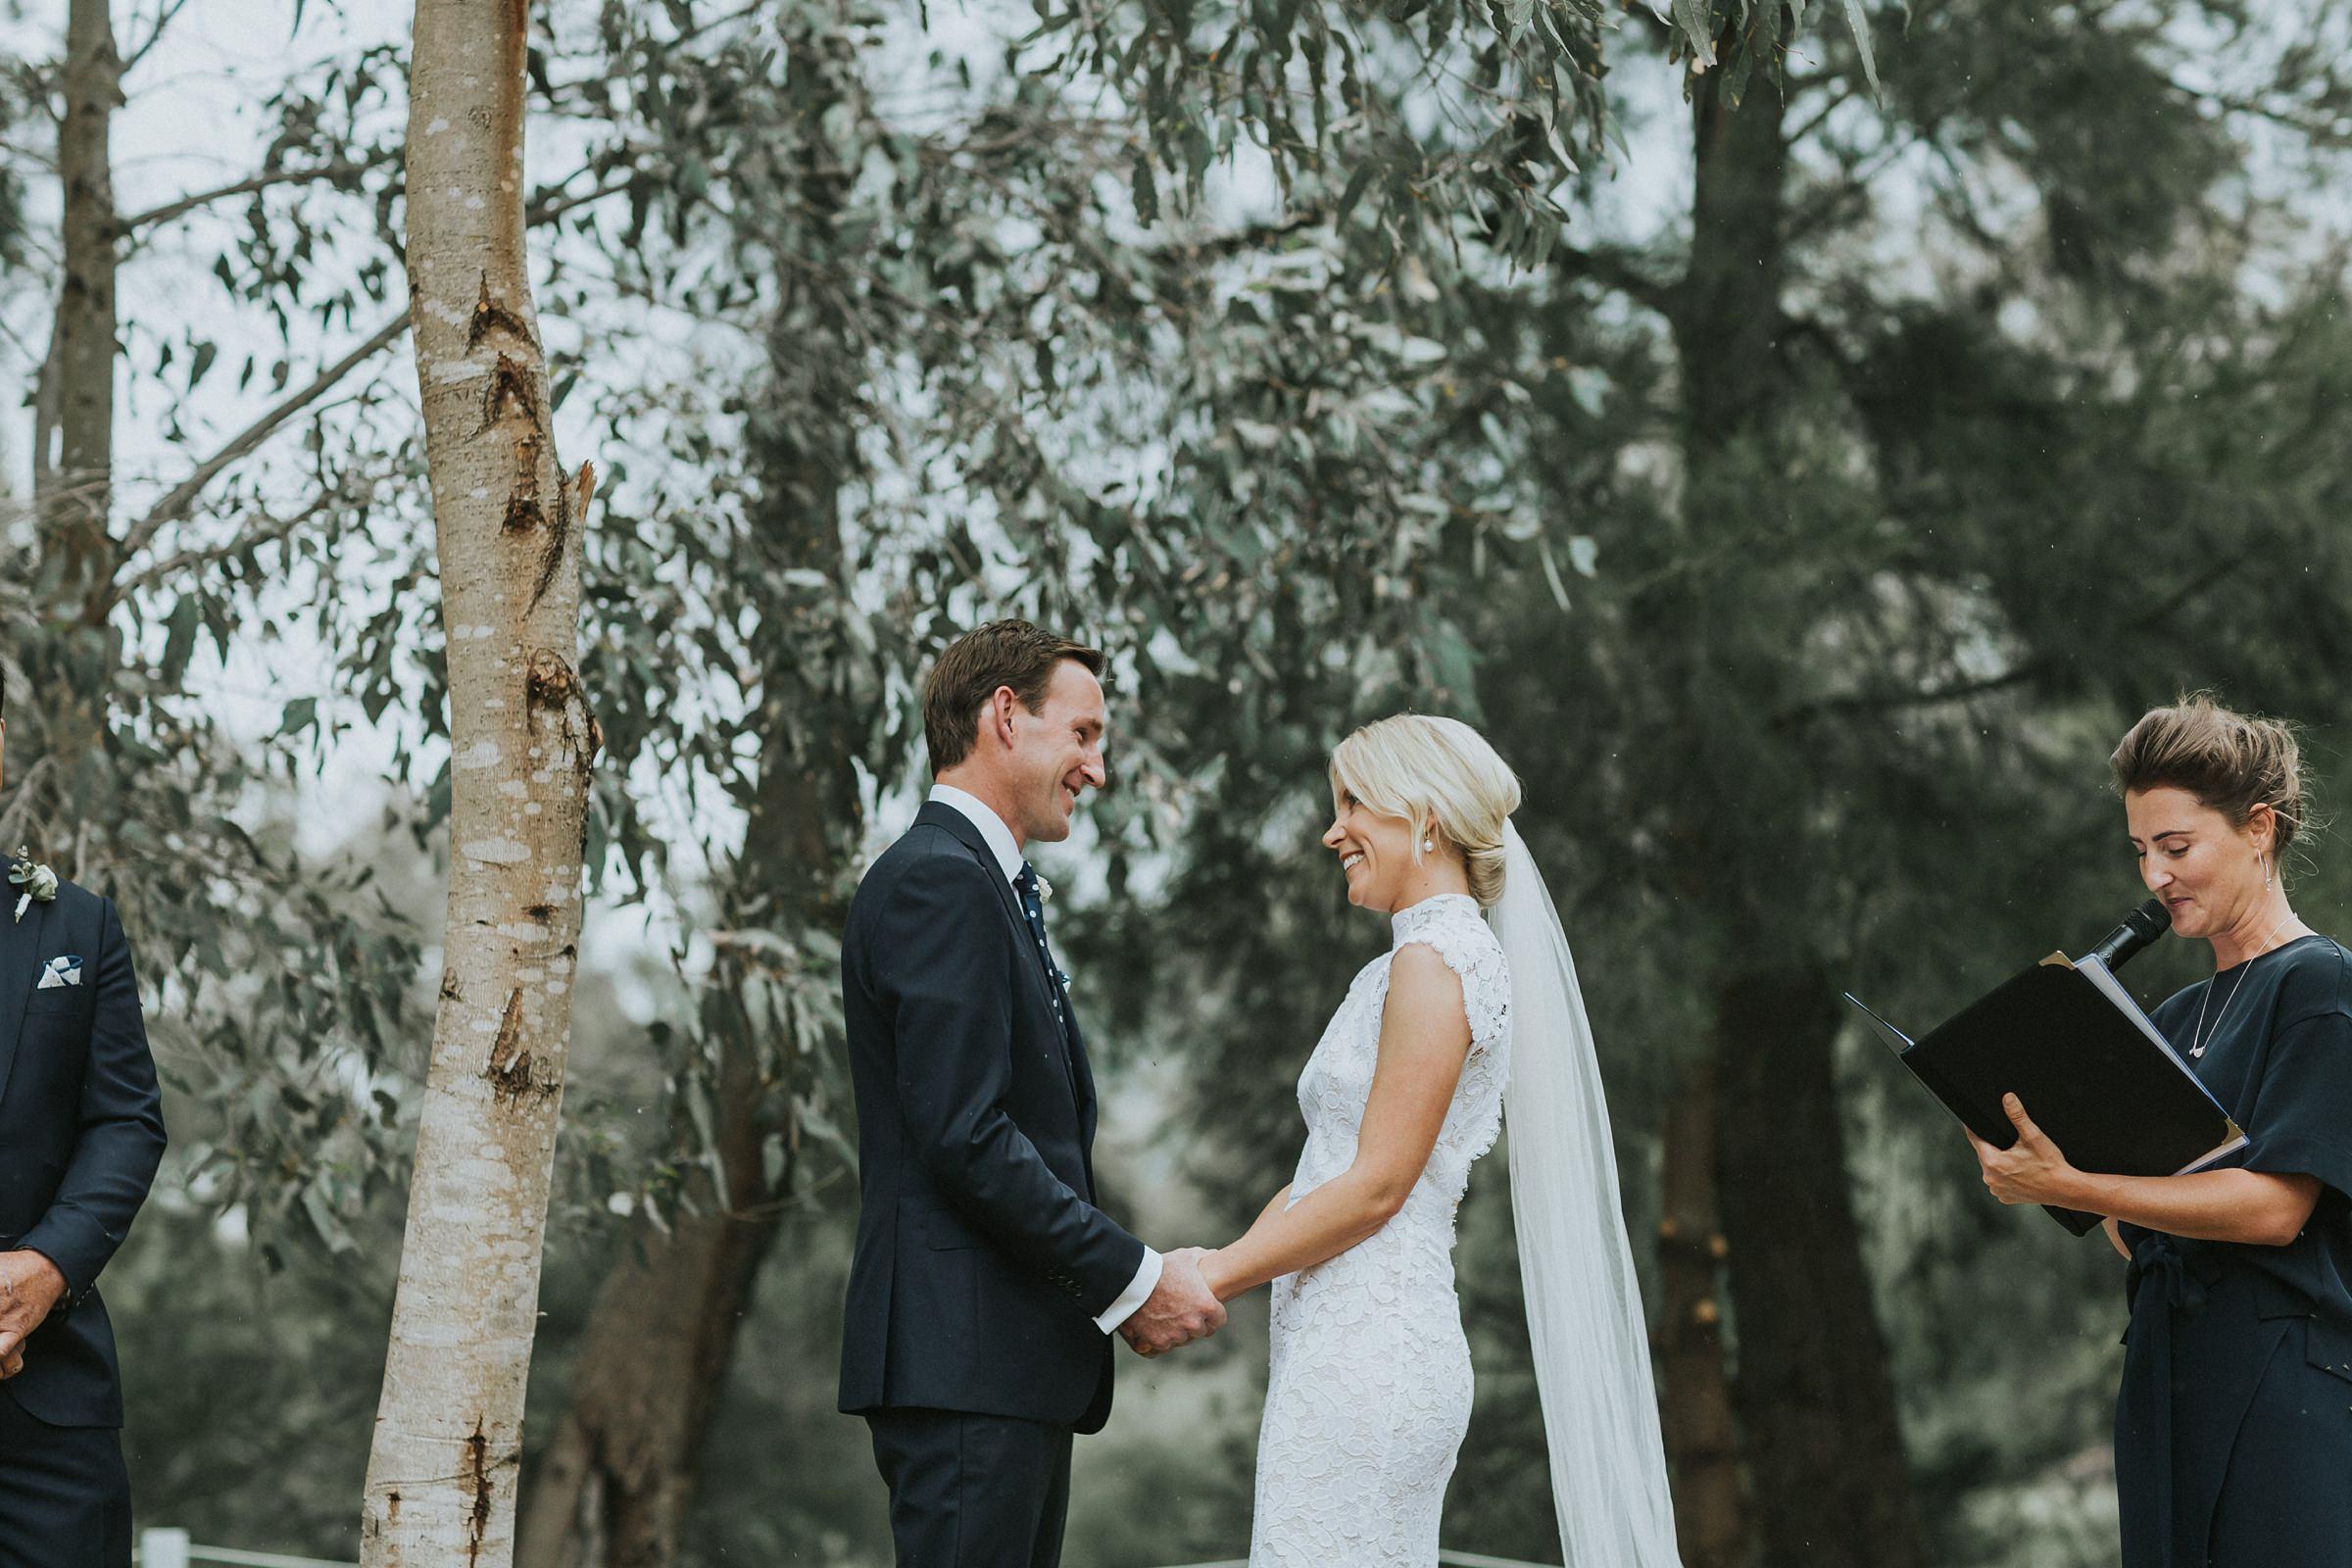 tumut nsw wedding ceremony photographed by jonathan david